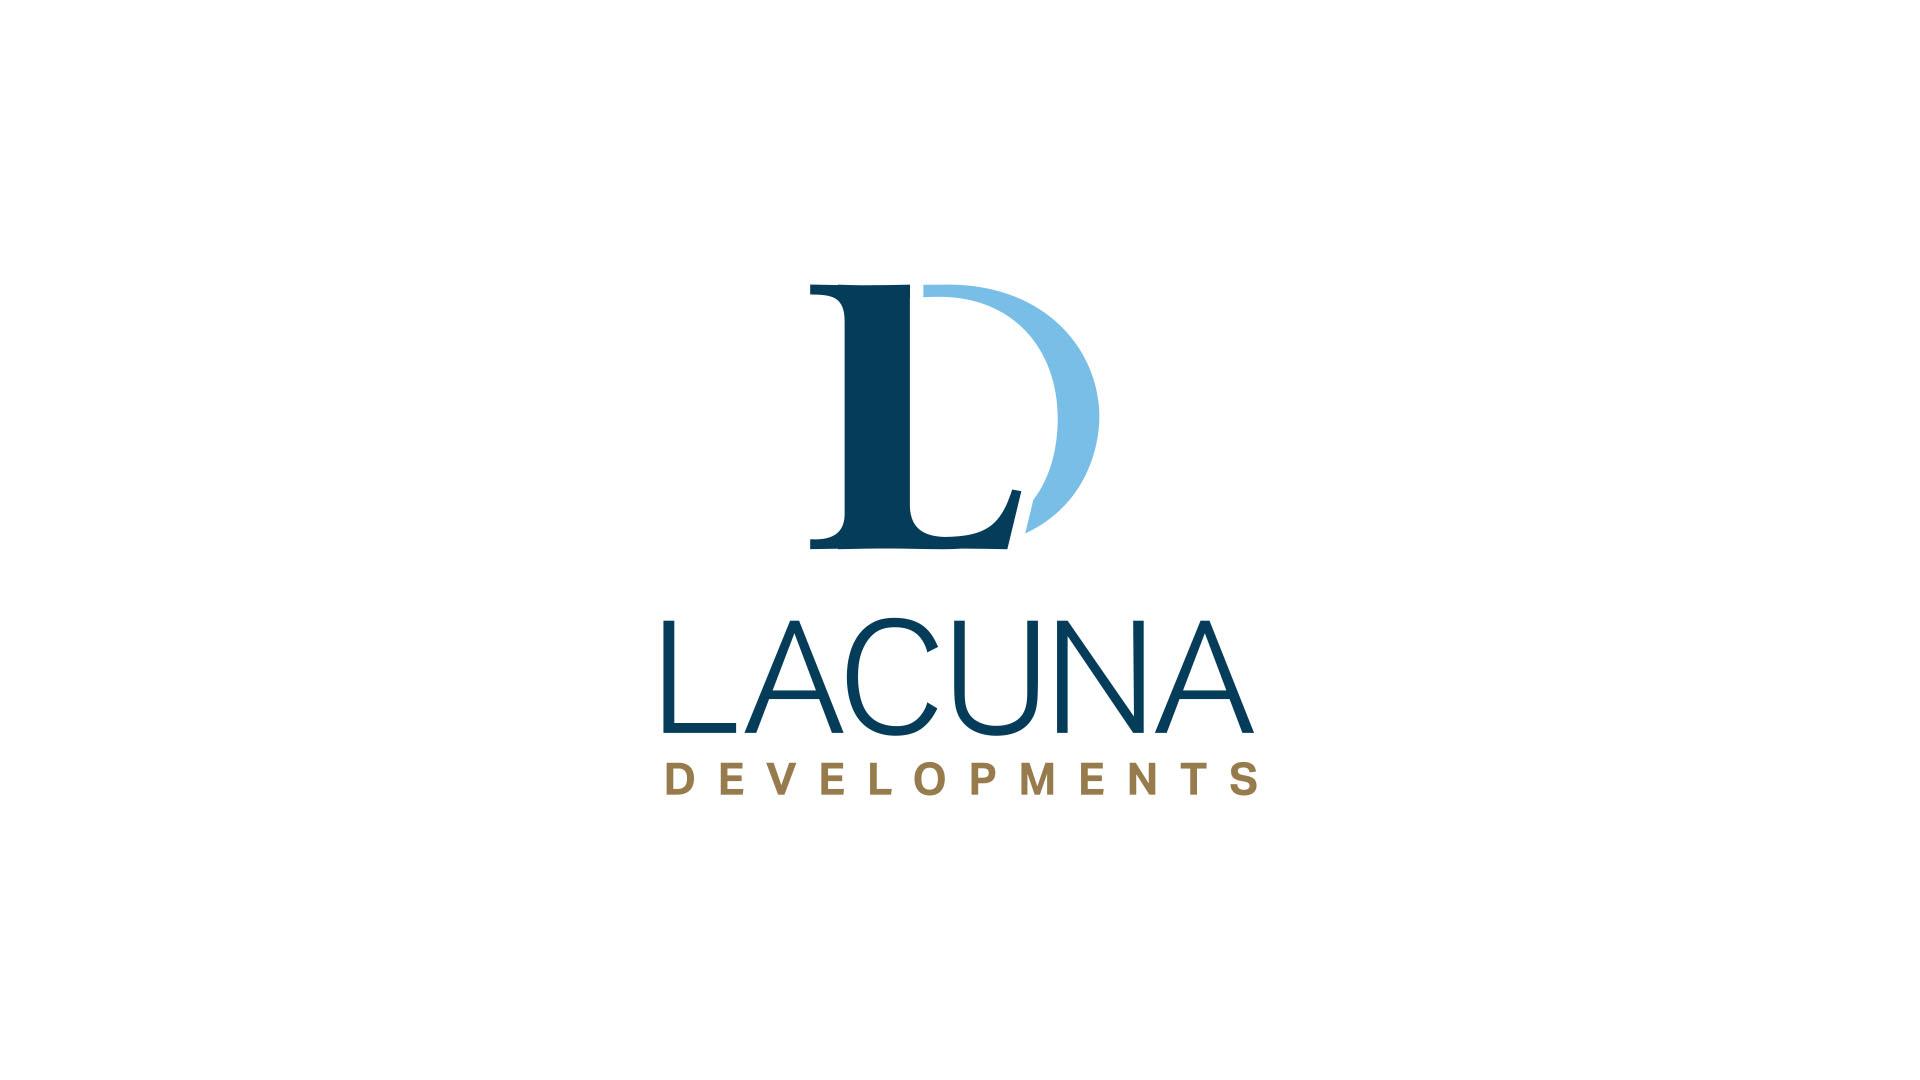 Lacuna Developments